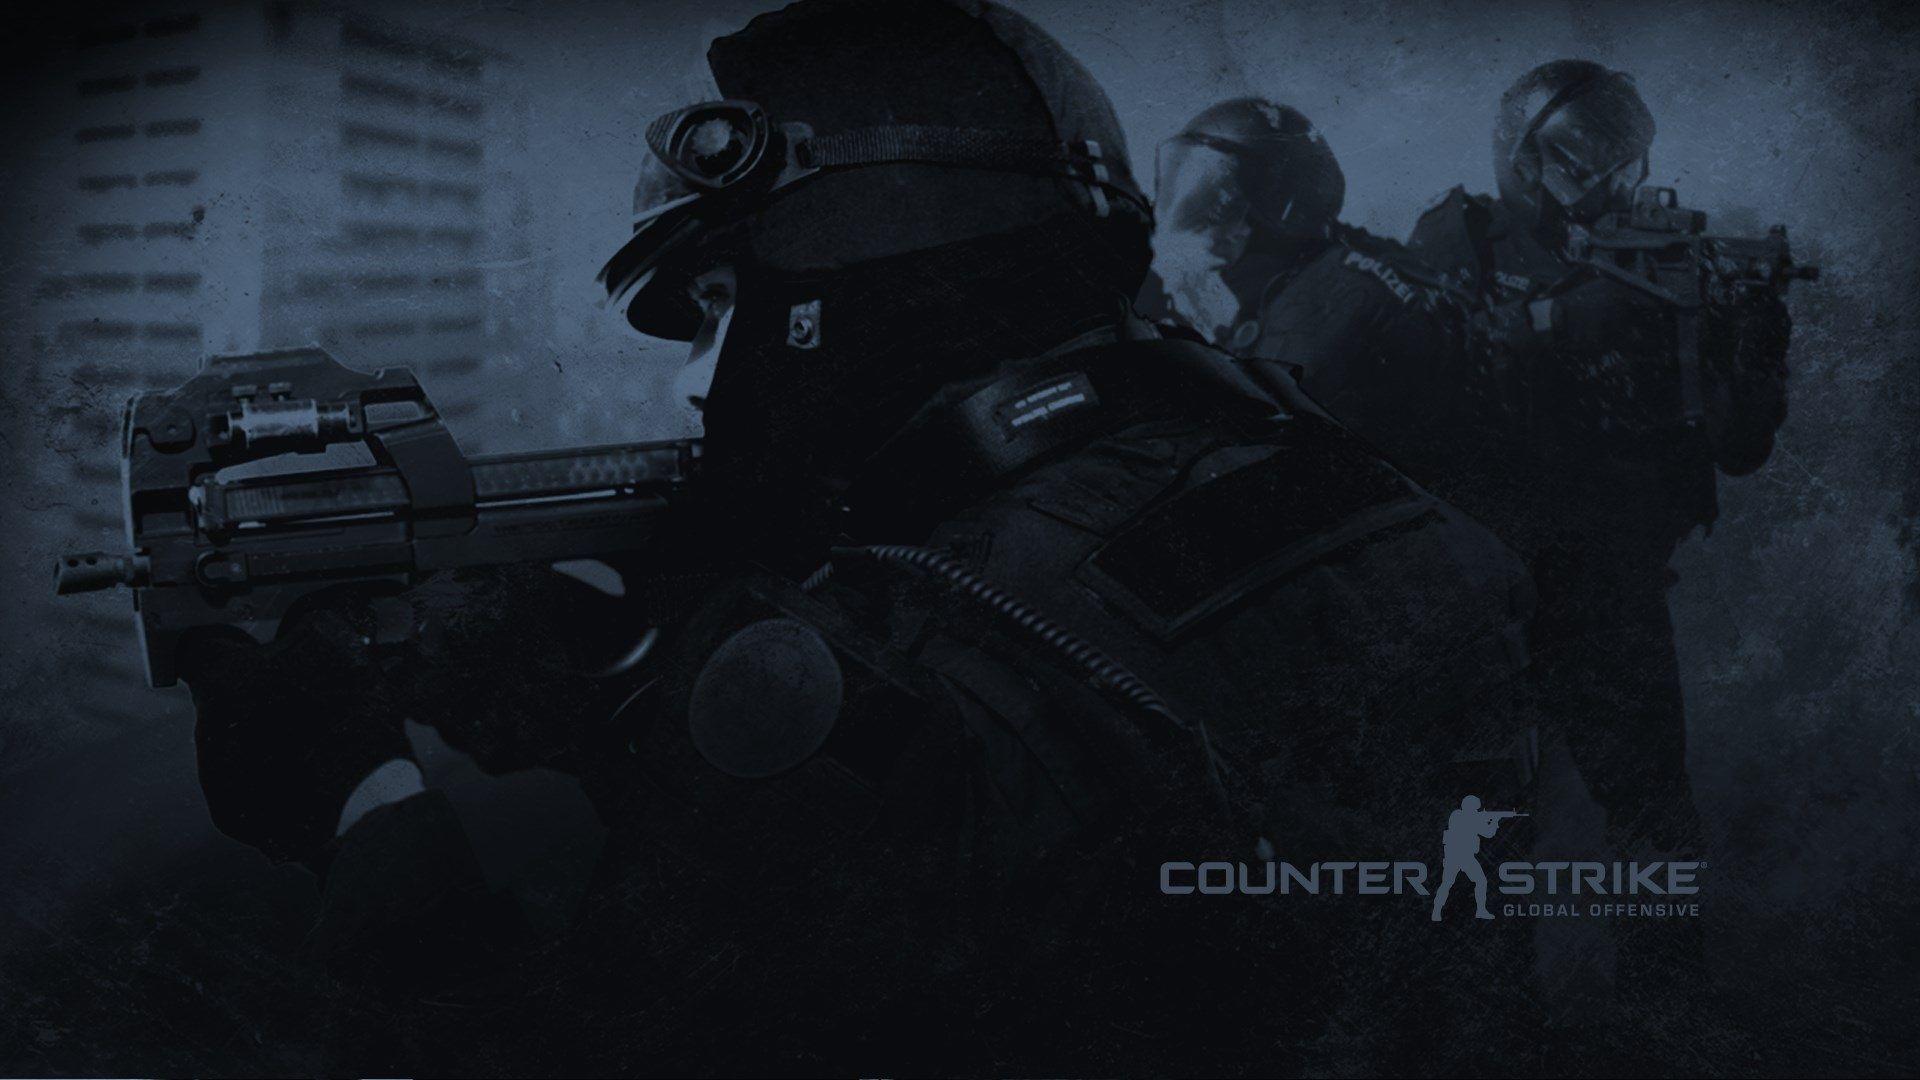 1920x1080 Counter Strike Wallpaper Download Free For Pc Hd Blizzcon Blizzard Entertainment Strike